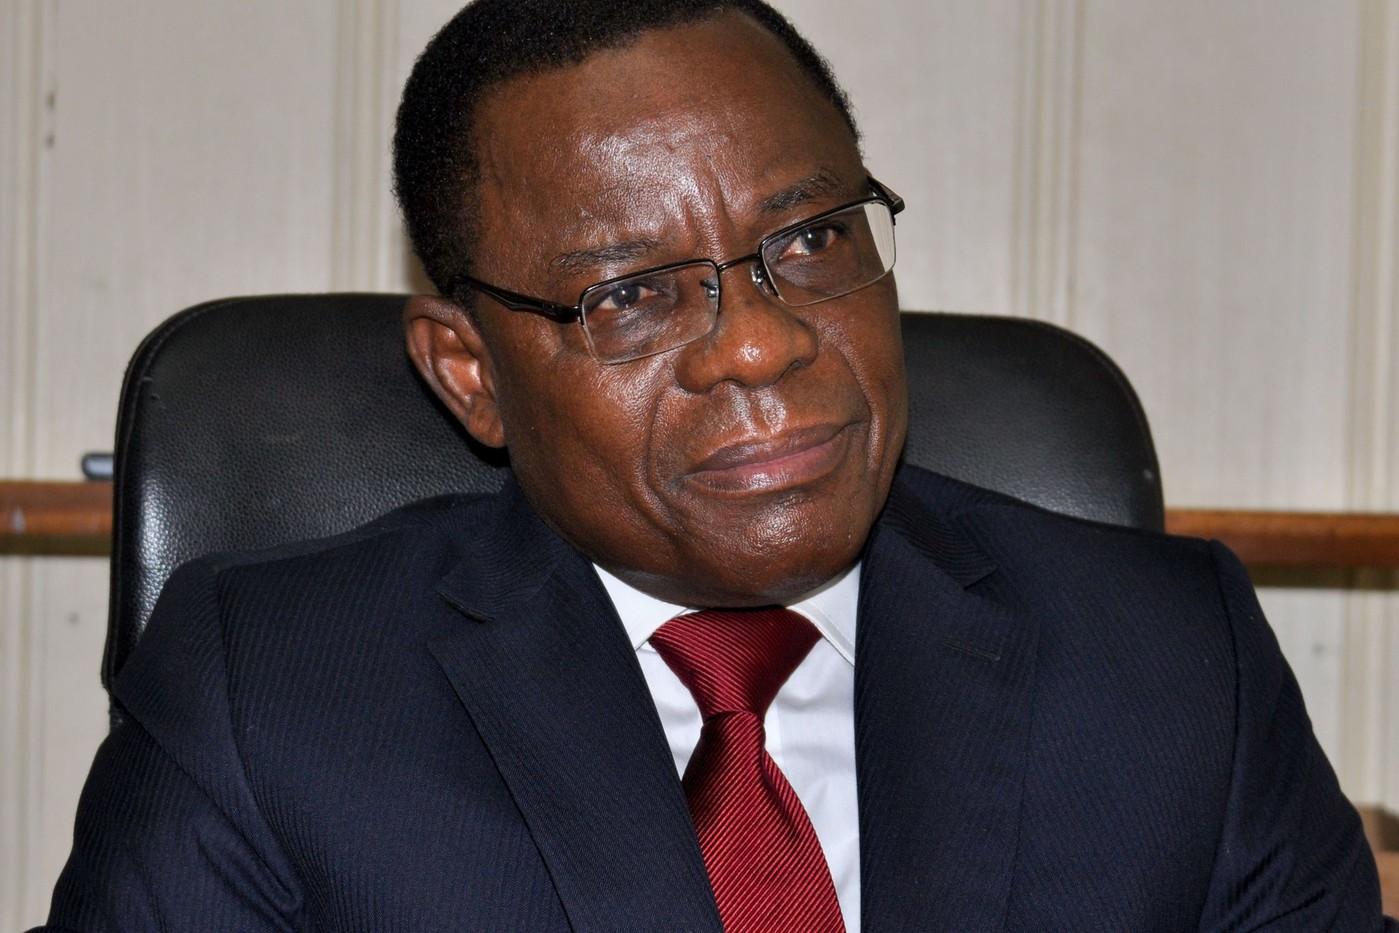 Anti-Paul Biya Protest: Opposition Leader Maurice Kamto Writes Under 'House Arrest'